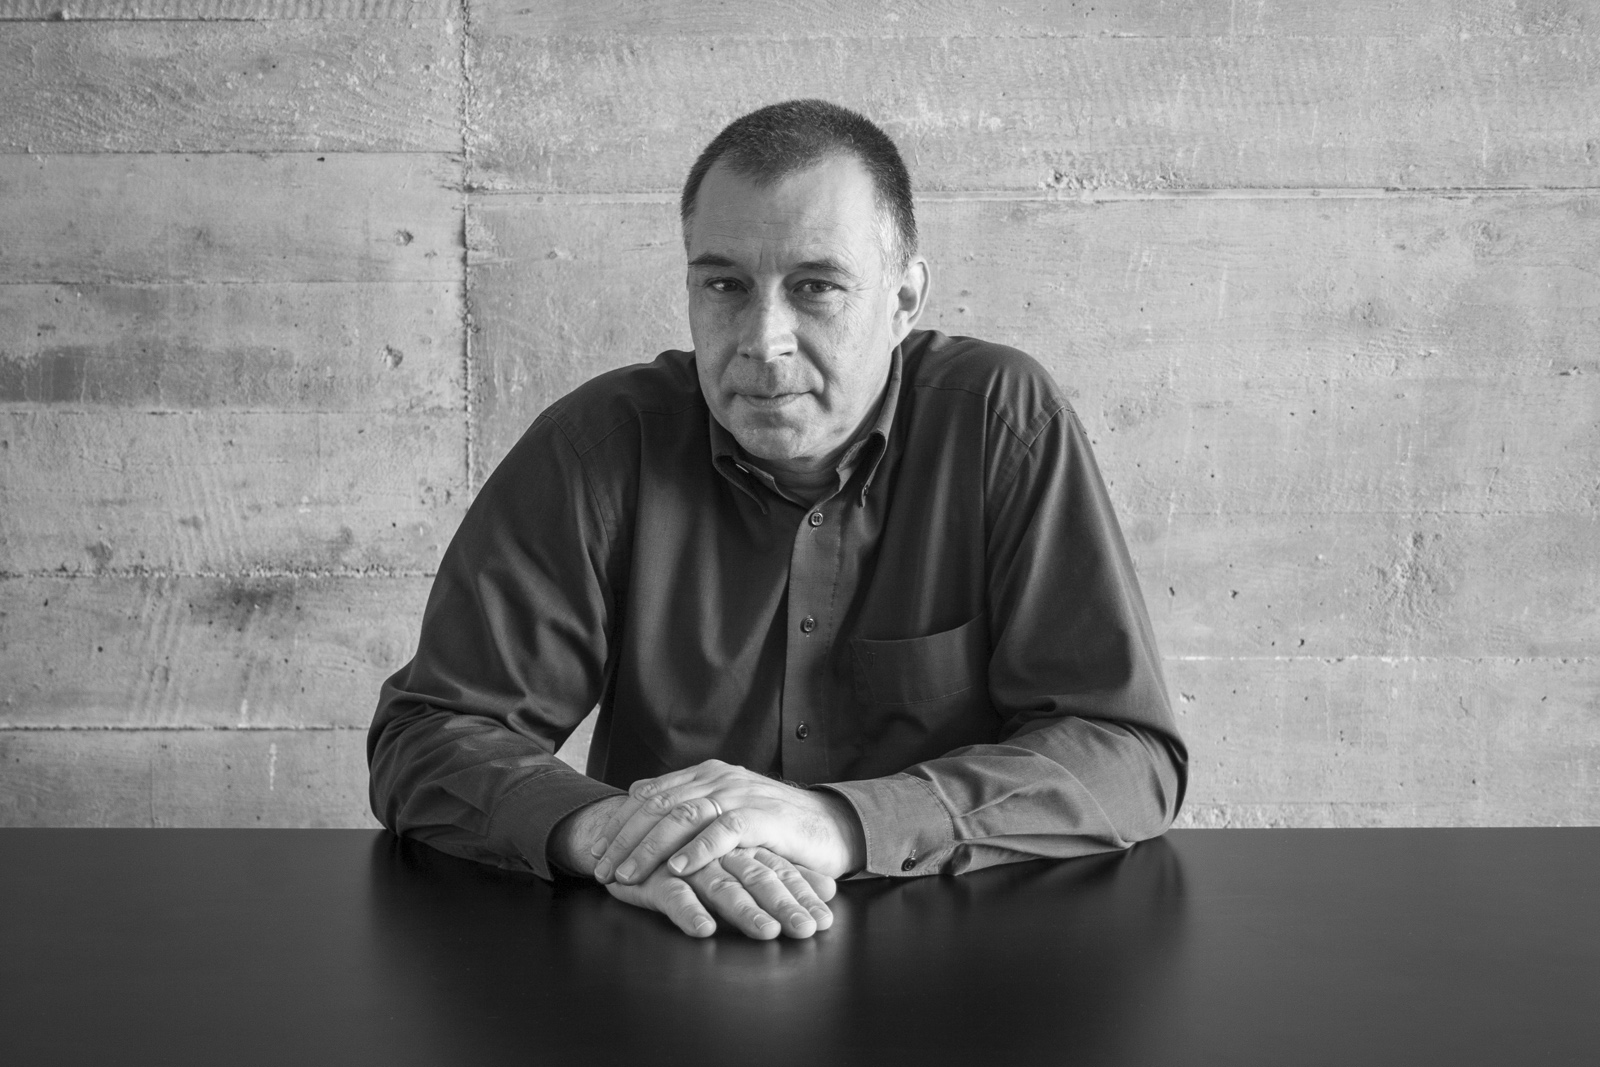 PolyU Design Public Lecture Prof Michael Renner